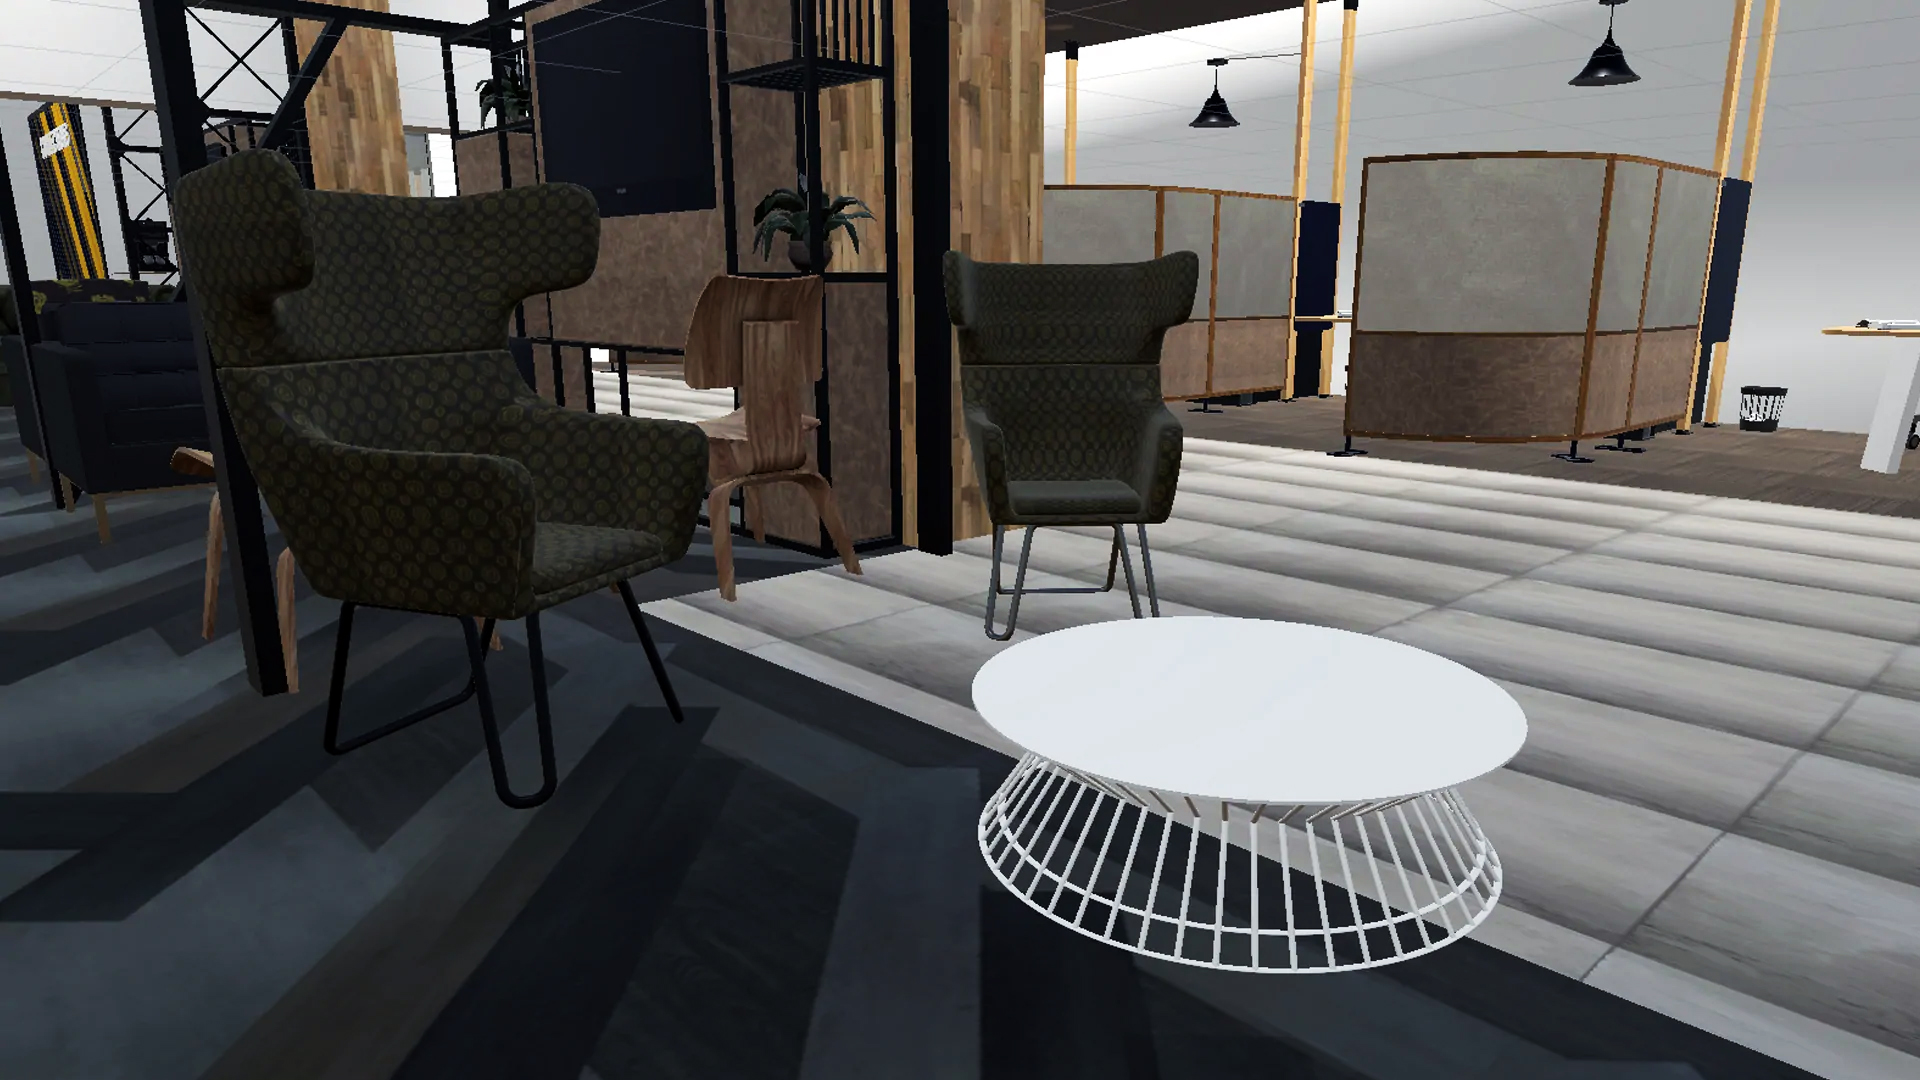 3d Render Model of furniture in the bank